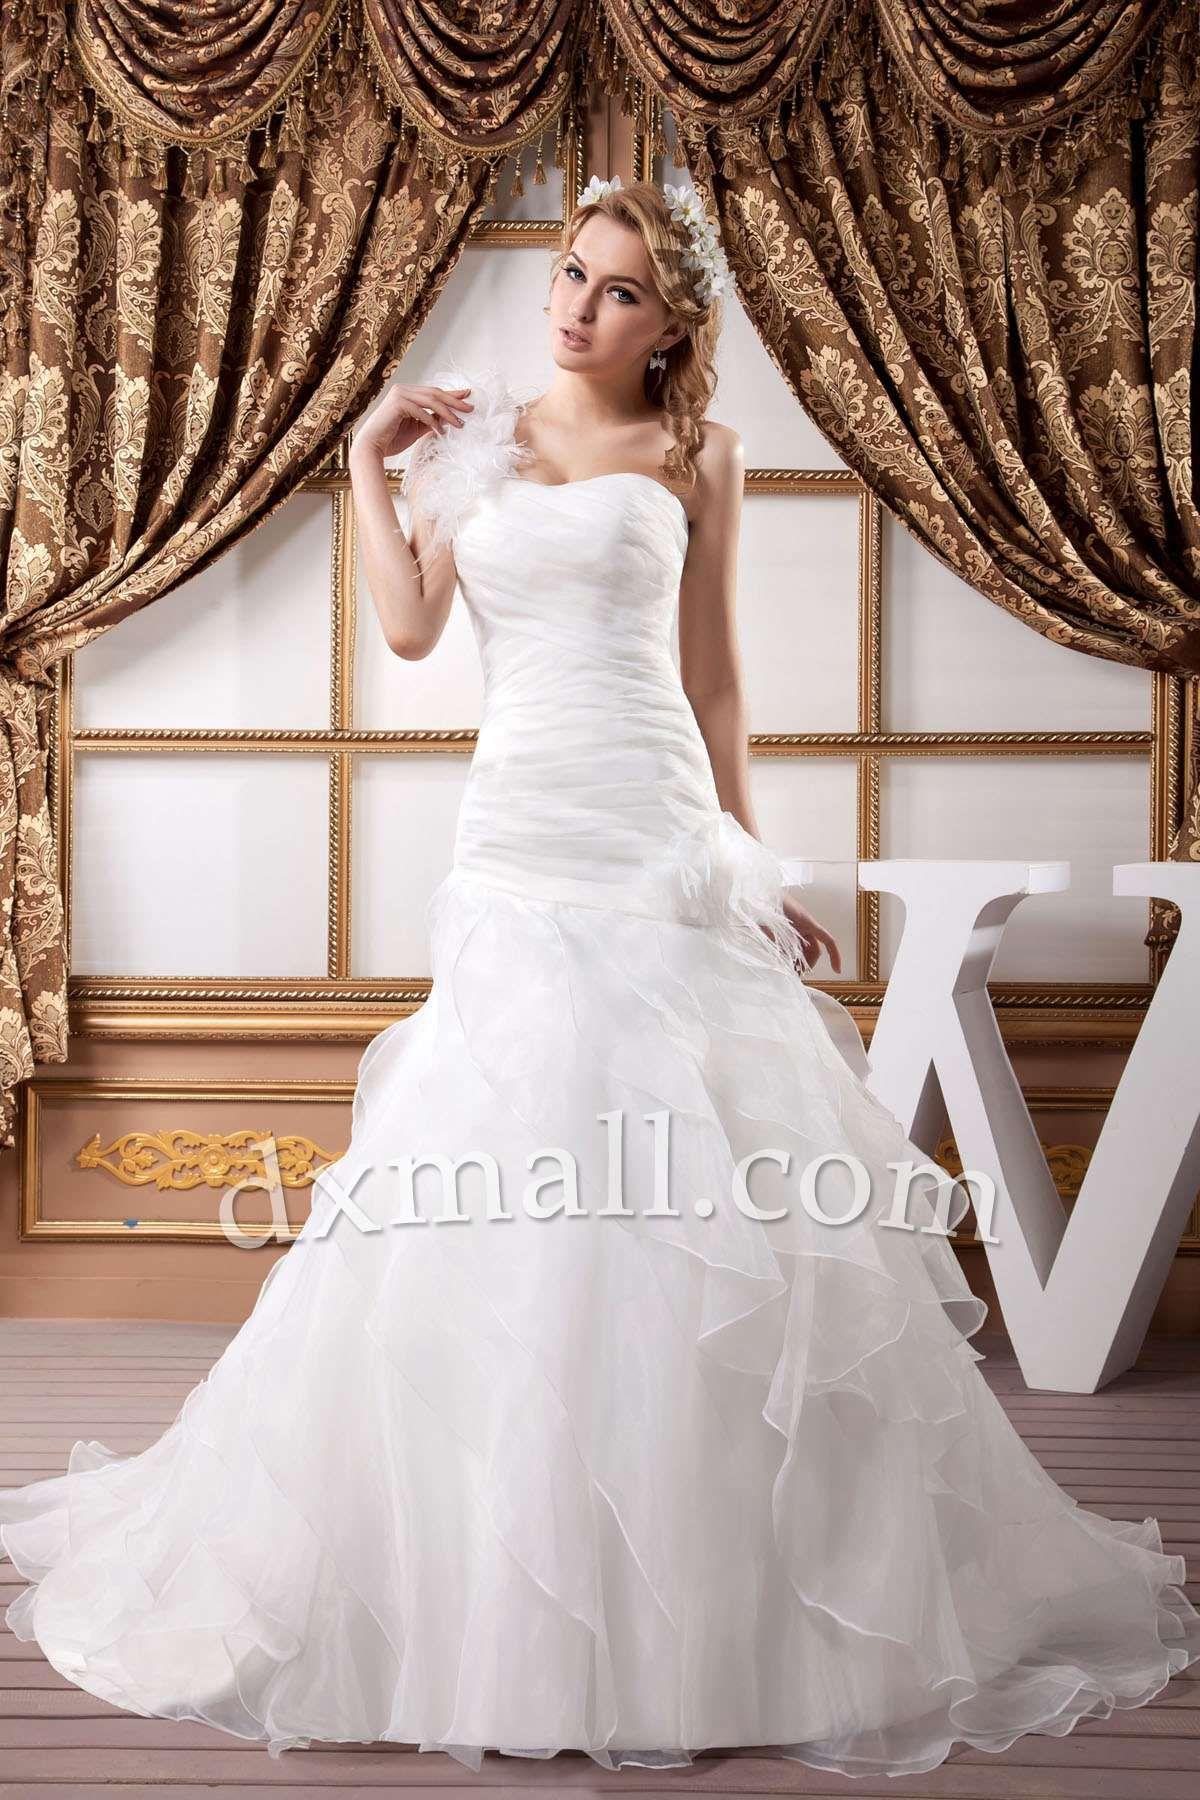 Dropped waist wedding dress  Drop Waist Wedding Dresses One Shoulder Court Train Organza Satin